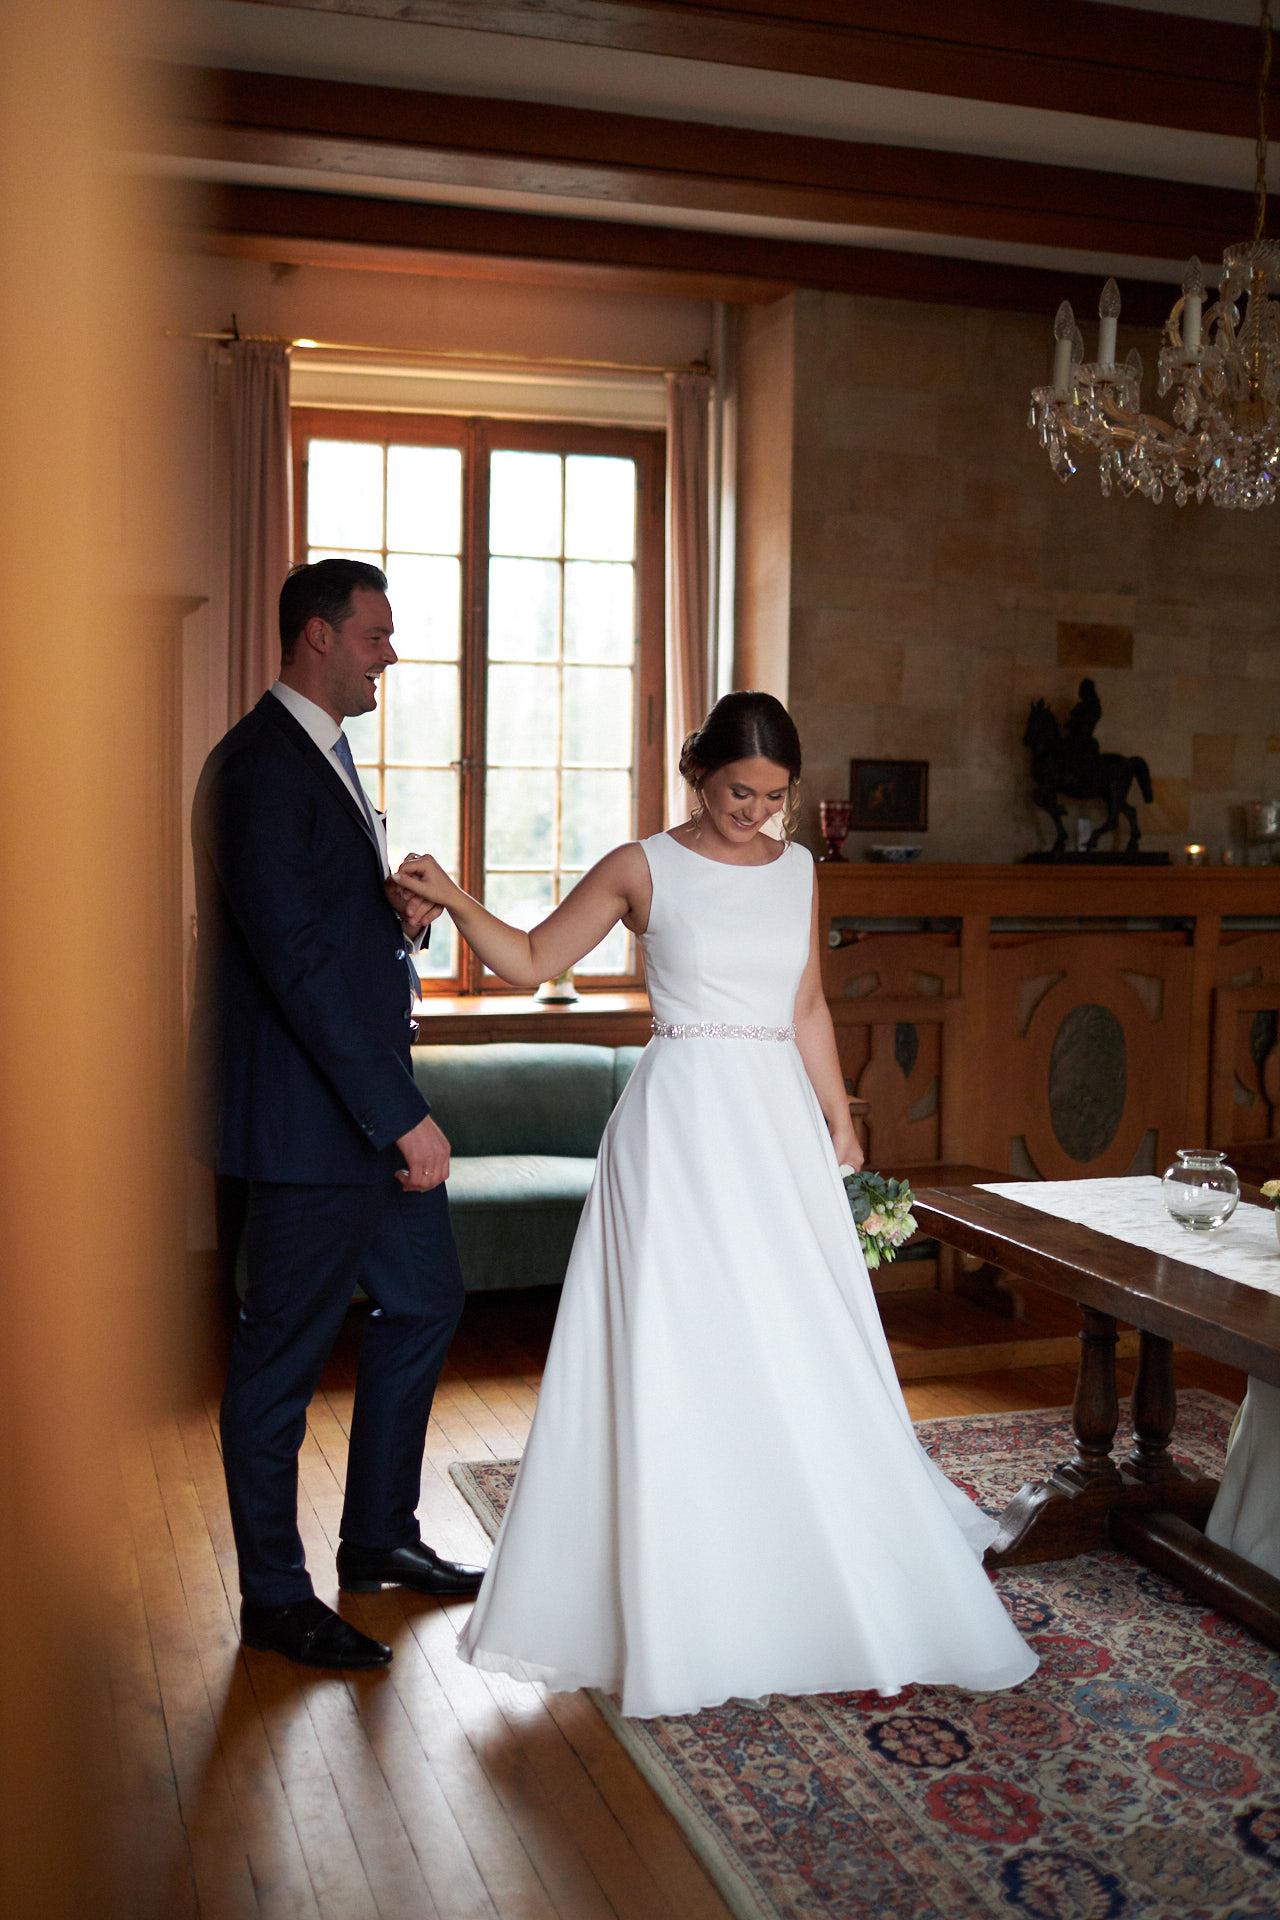 2019-12-20 Laura & Robin - Alena and Daniel Weddings 0204 1